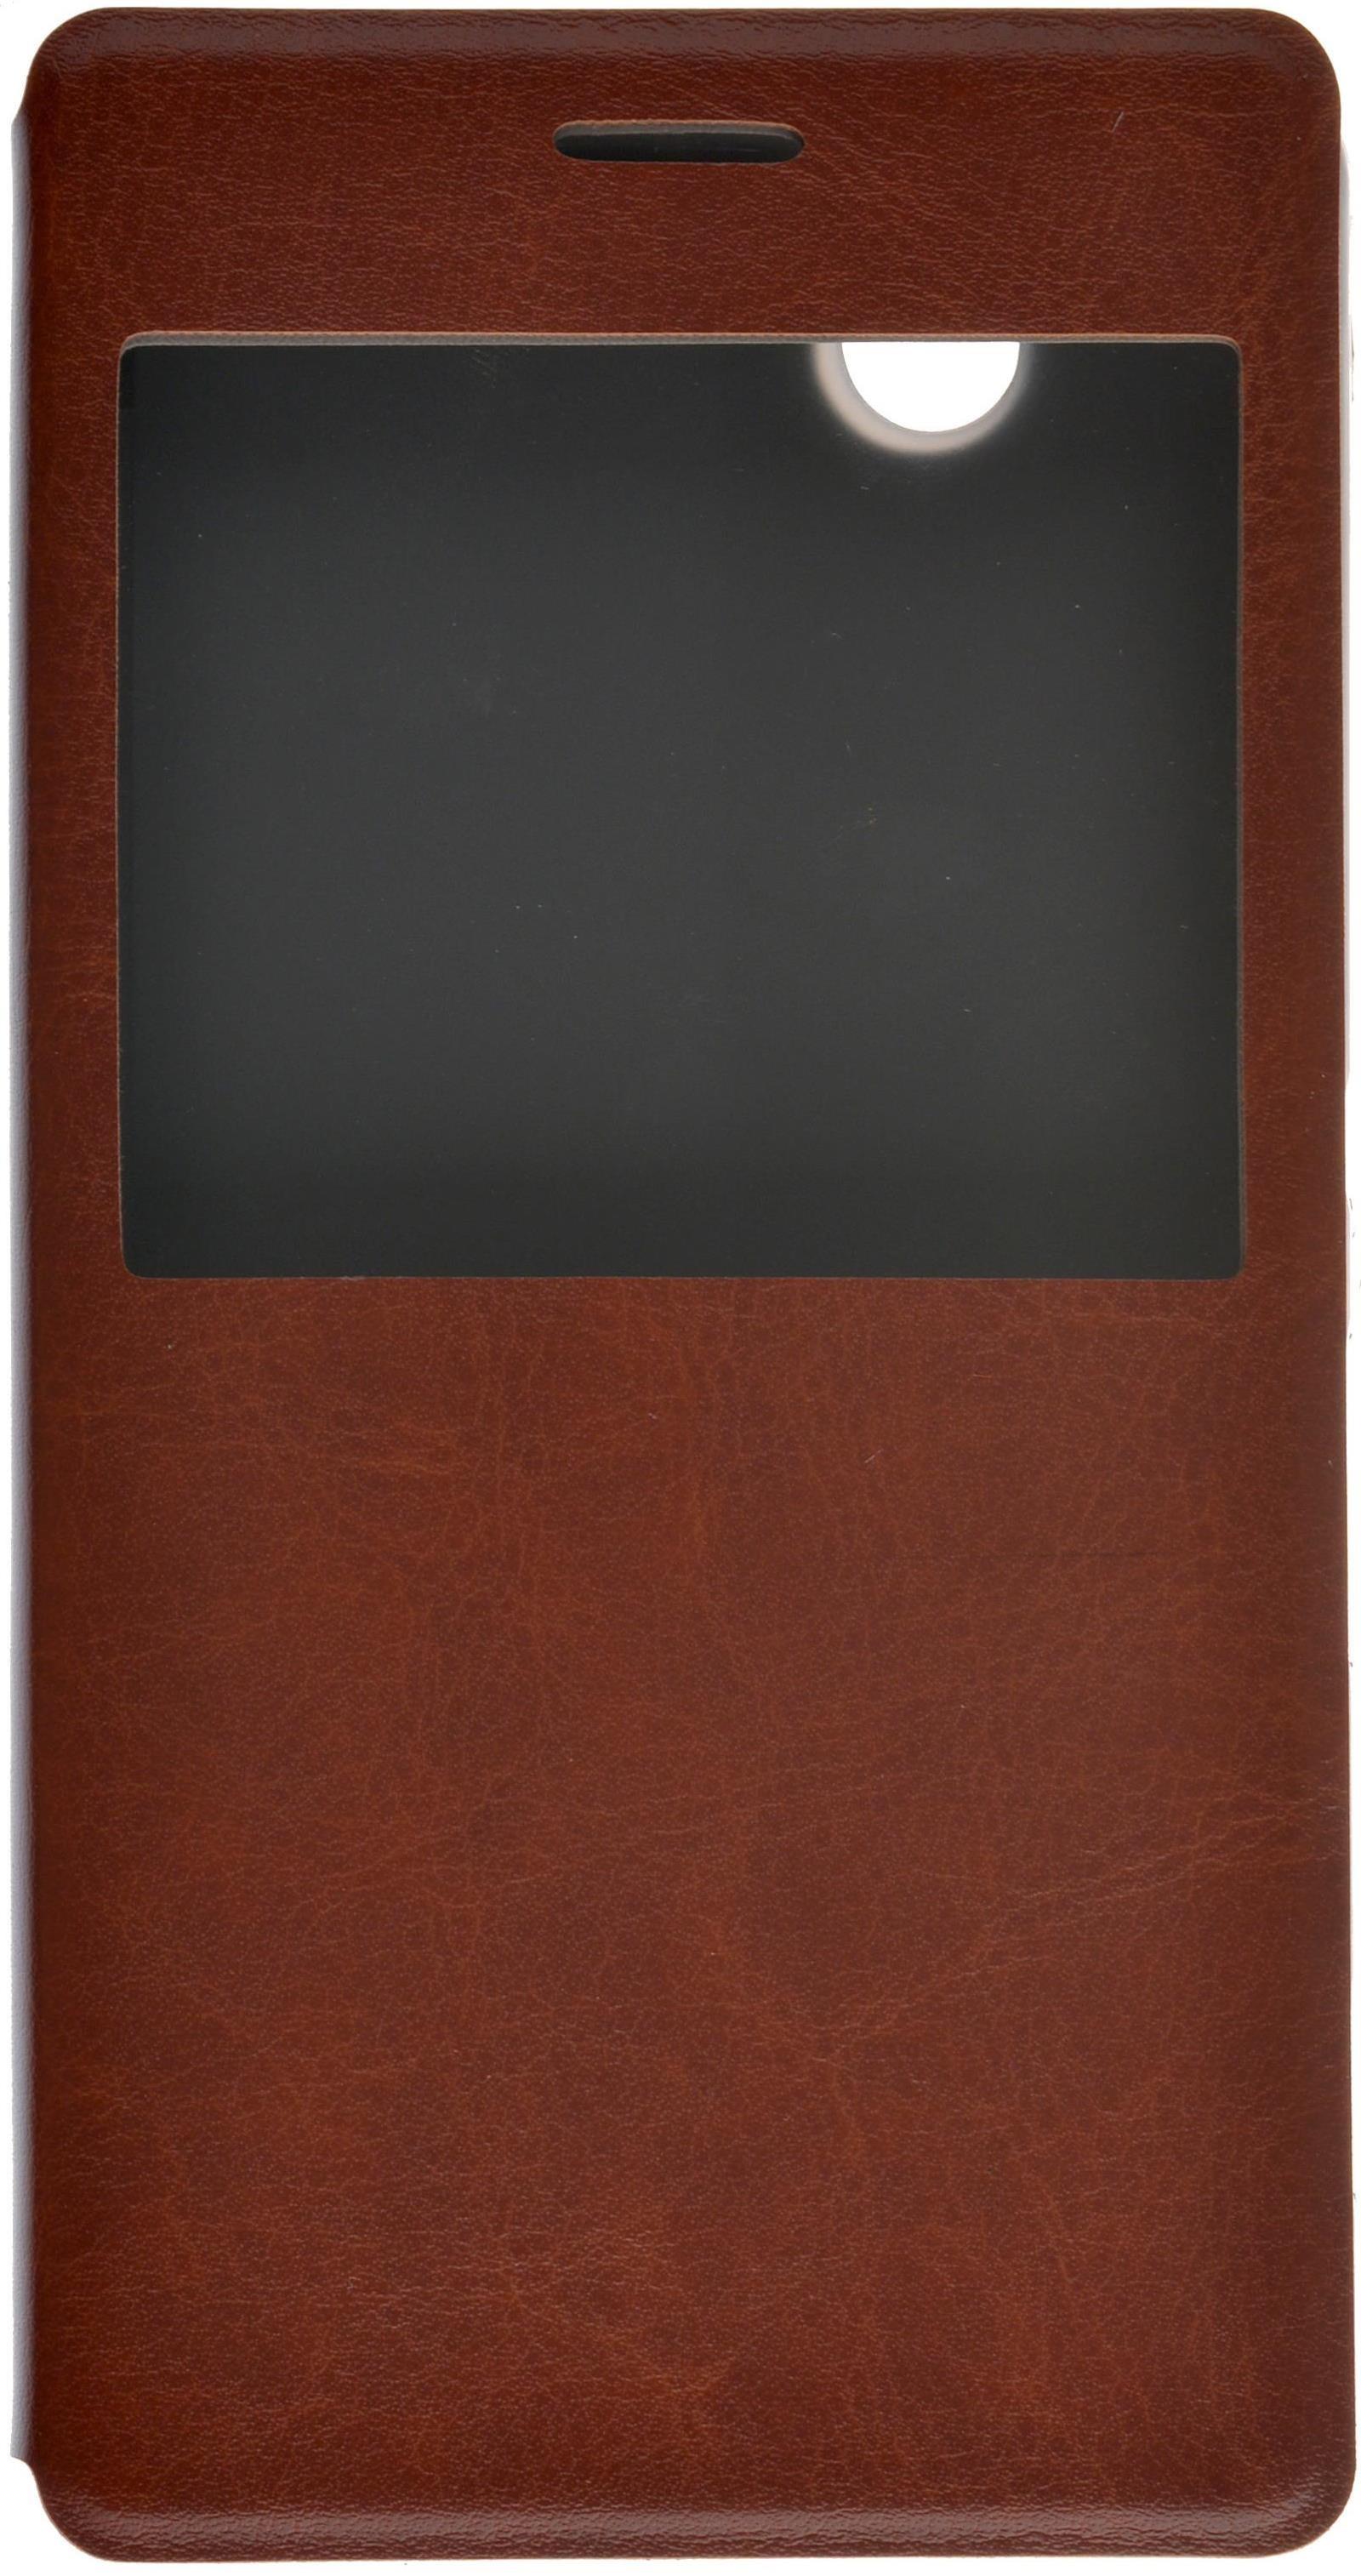 цена на Чехол для сотового телефона skinBOX Lux AW, 4630042527232, коричневый